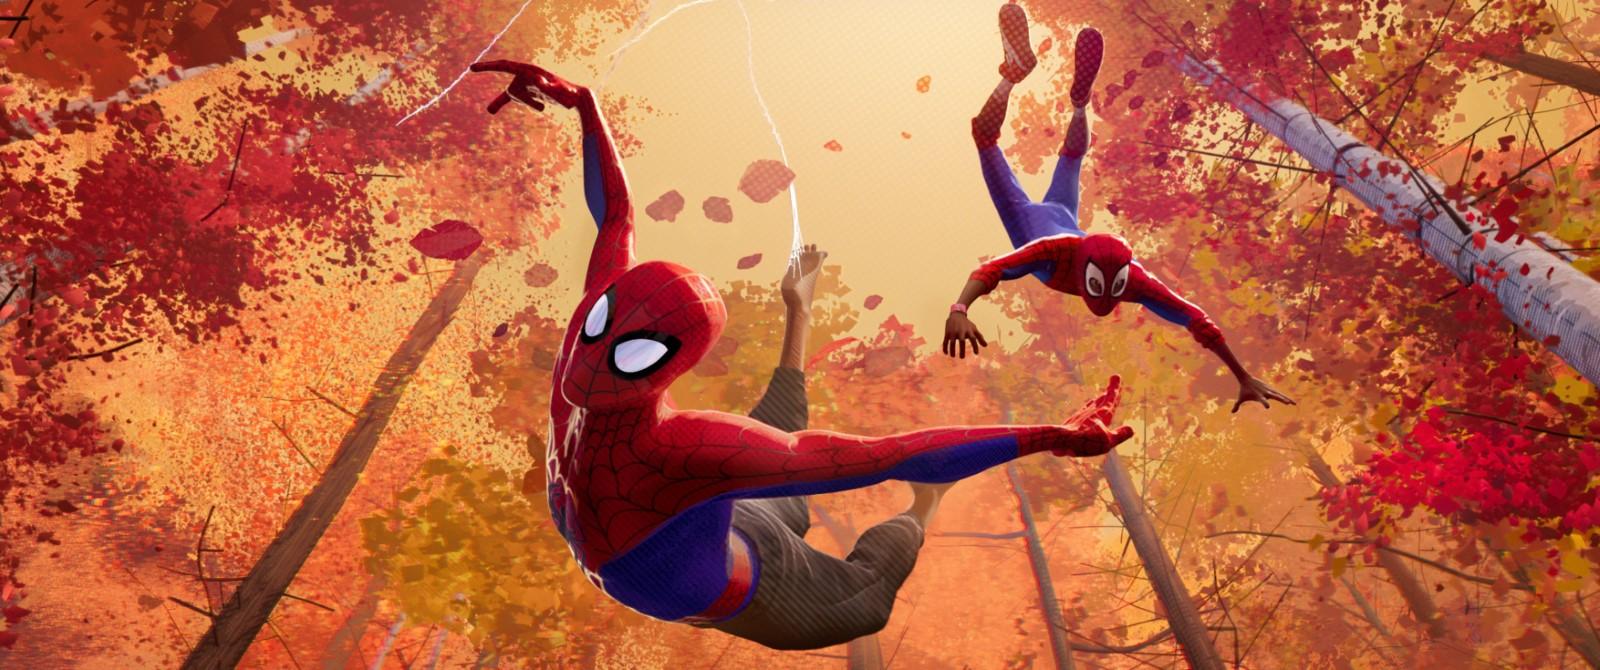 [Films Animés] Spider-Man: New Generation 2851647